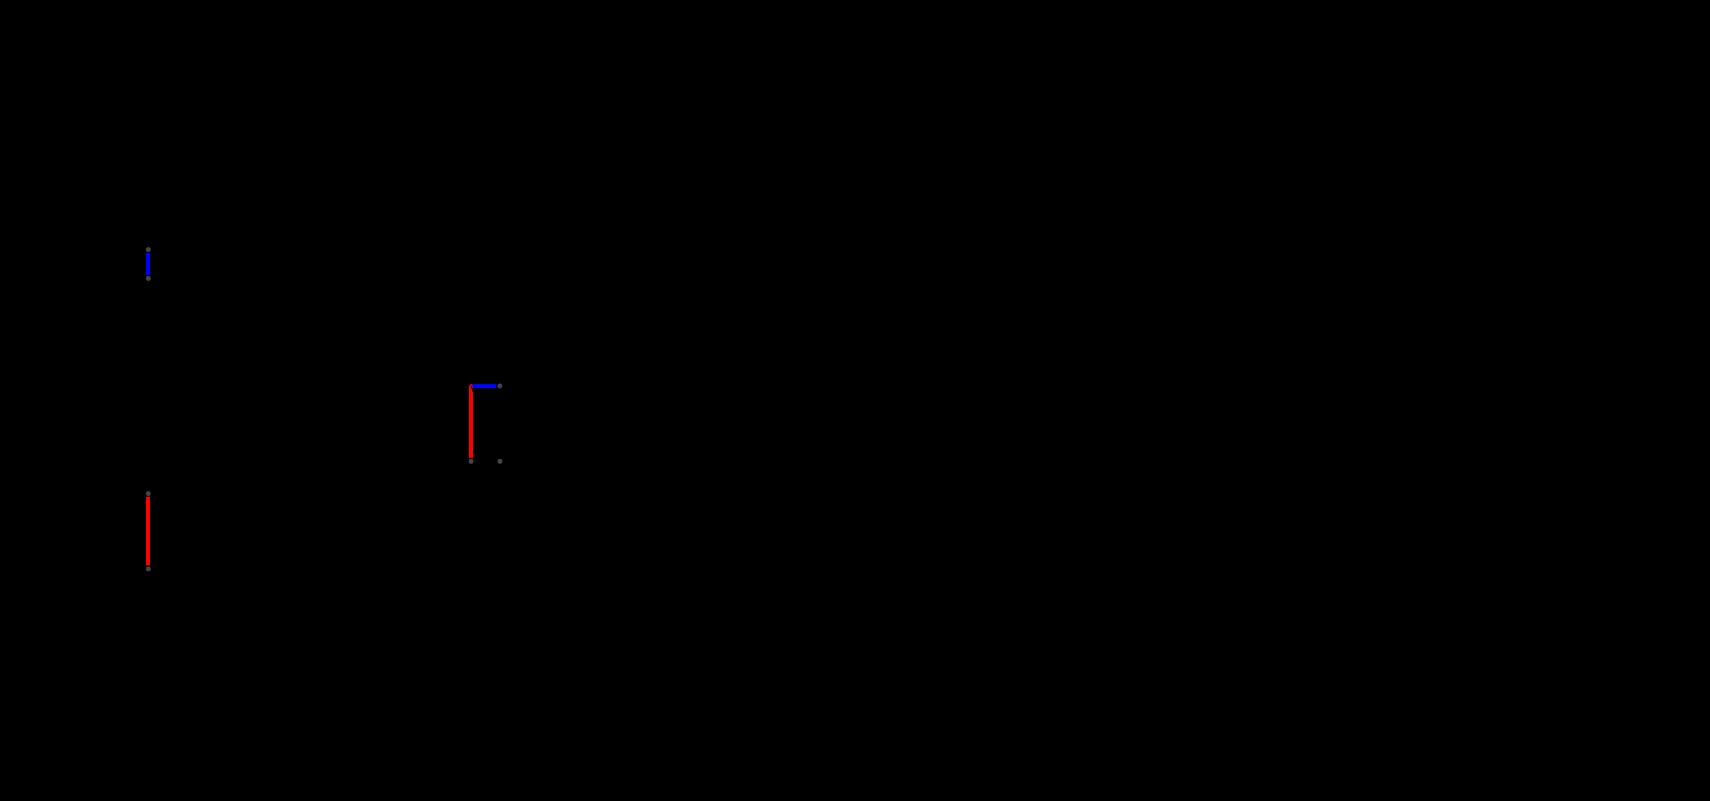 Parametric Plotting tutorial